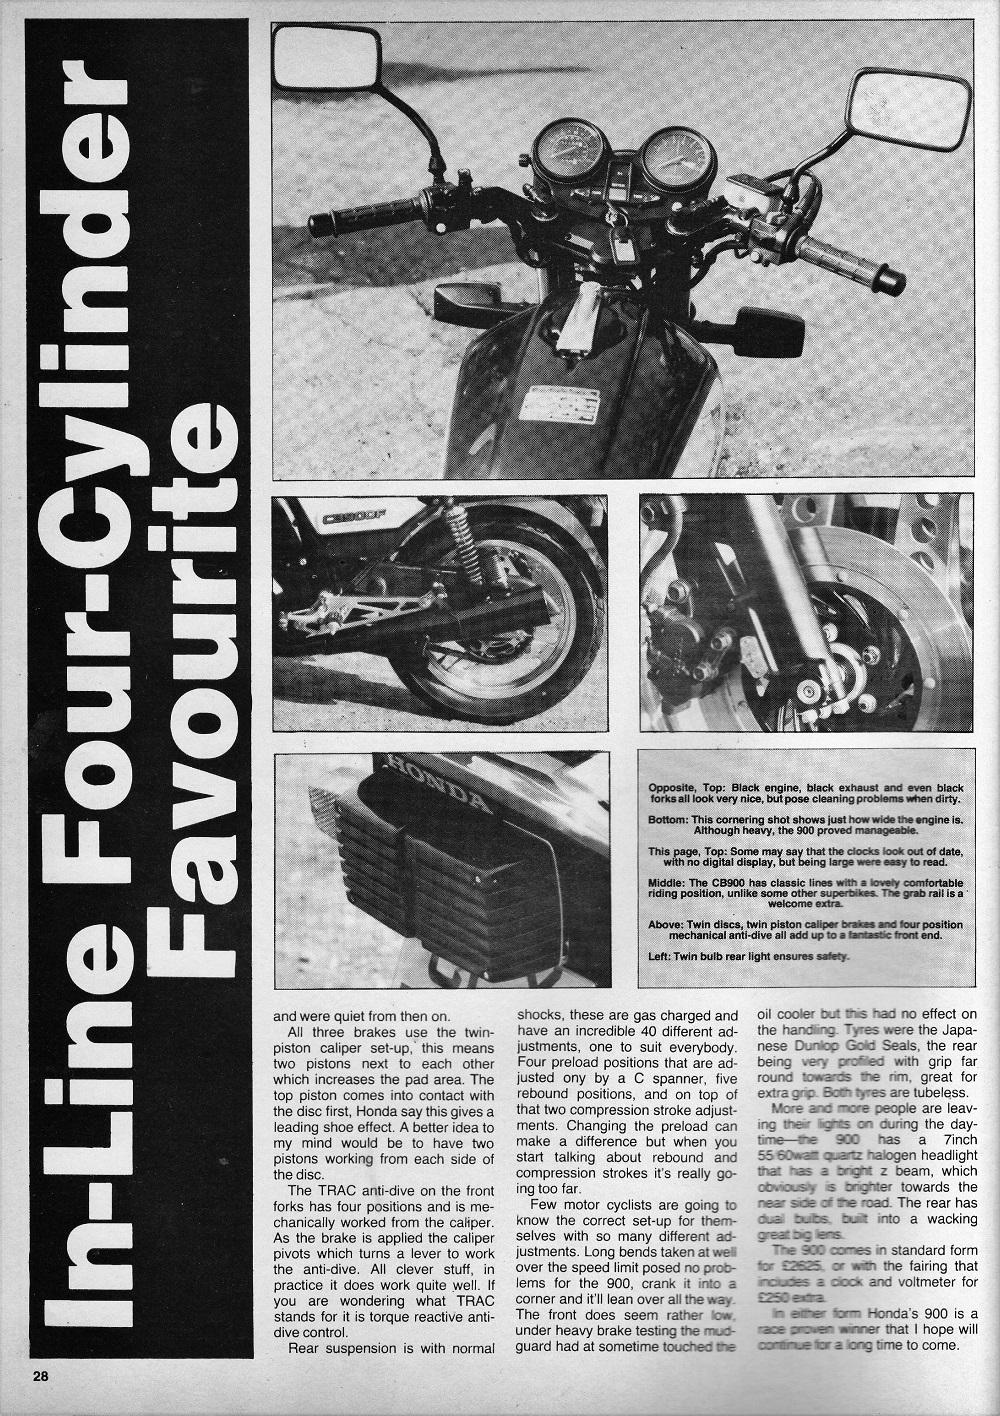 1983 Honda CB900F-D road test.3.jpg